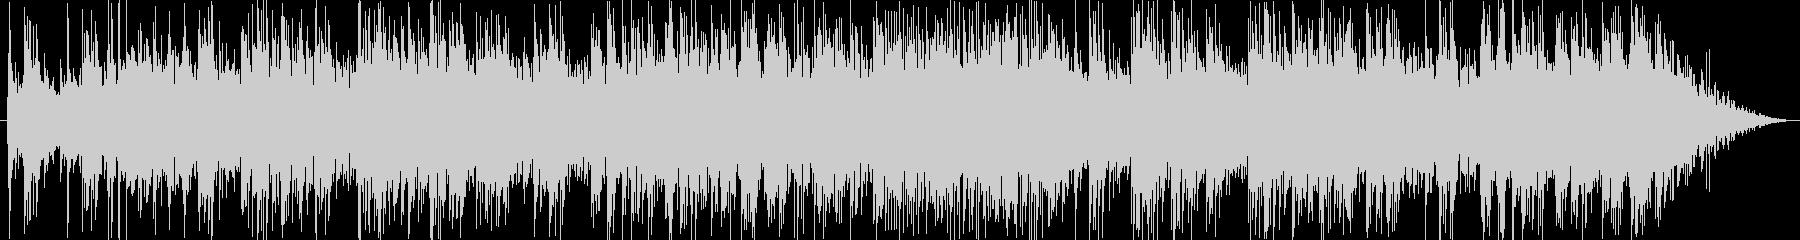 Medium tempo guitar pops's unreproduced waveform